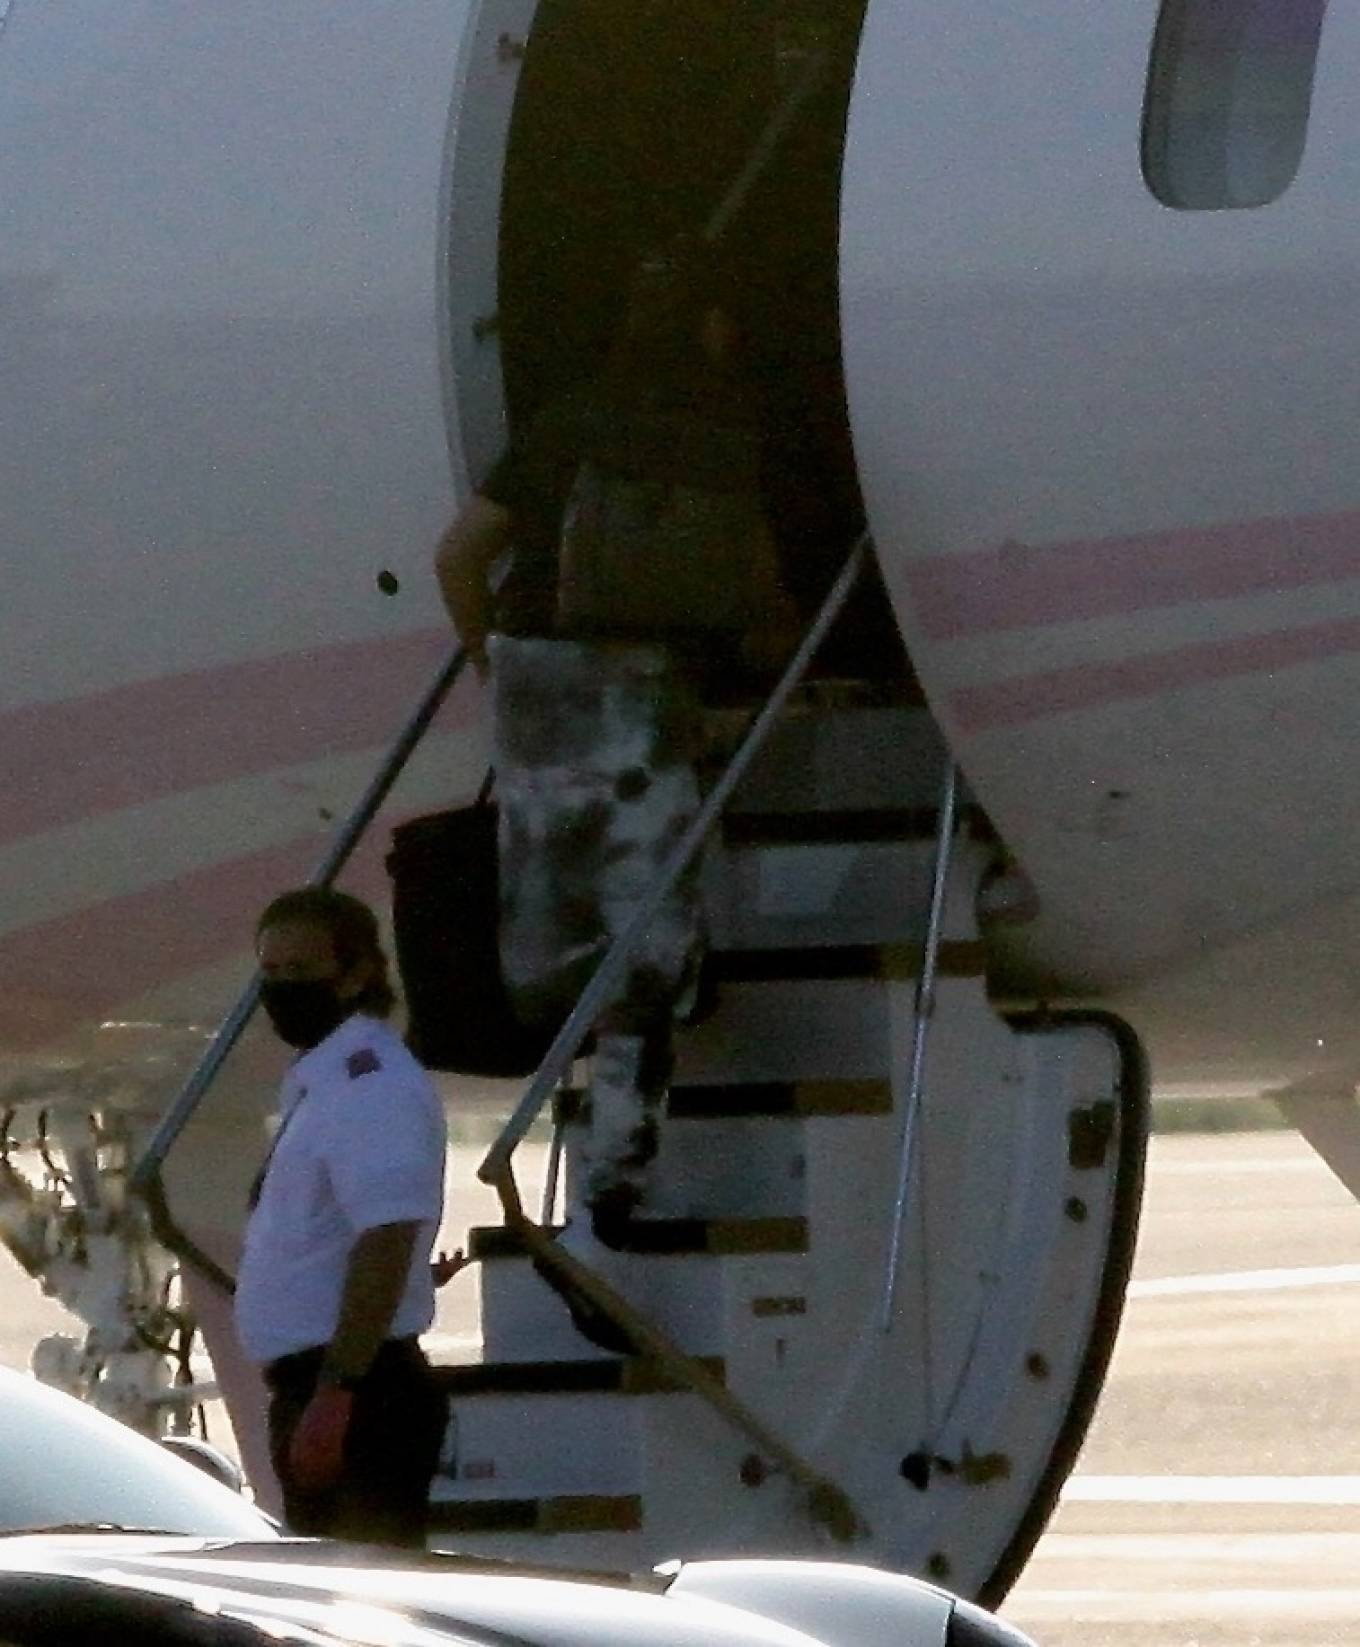 Khloe Kardashian 2020 : Khloe Kardashian and Kourtney Kardashian – Pictured boarding Kylie Jenners private jet in Van Nuys-02